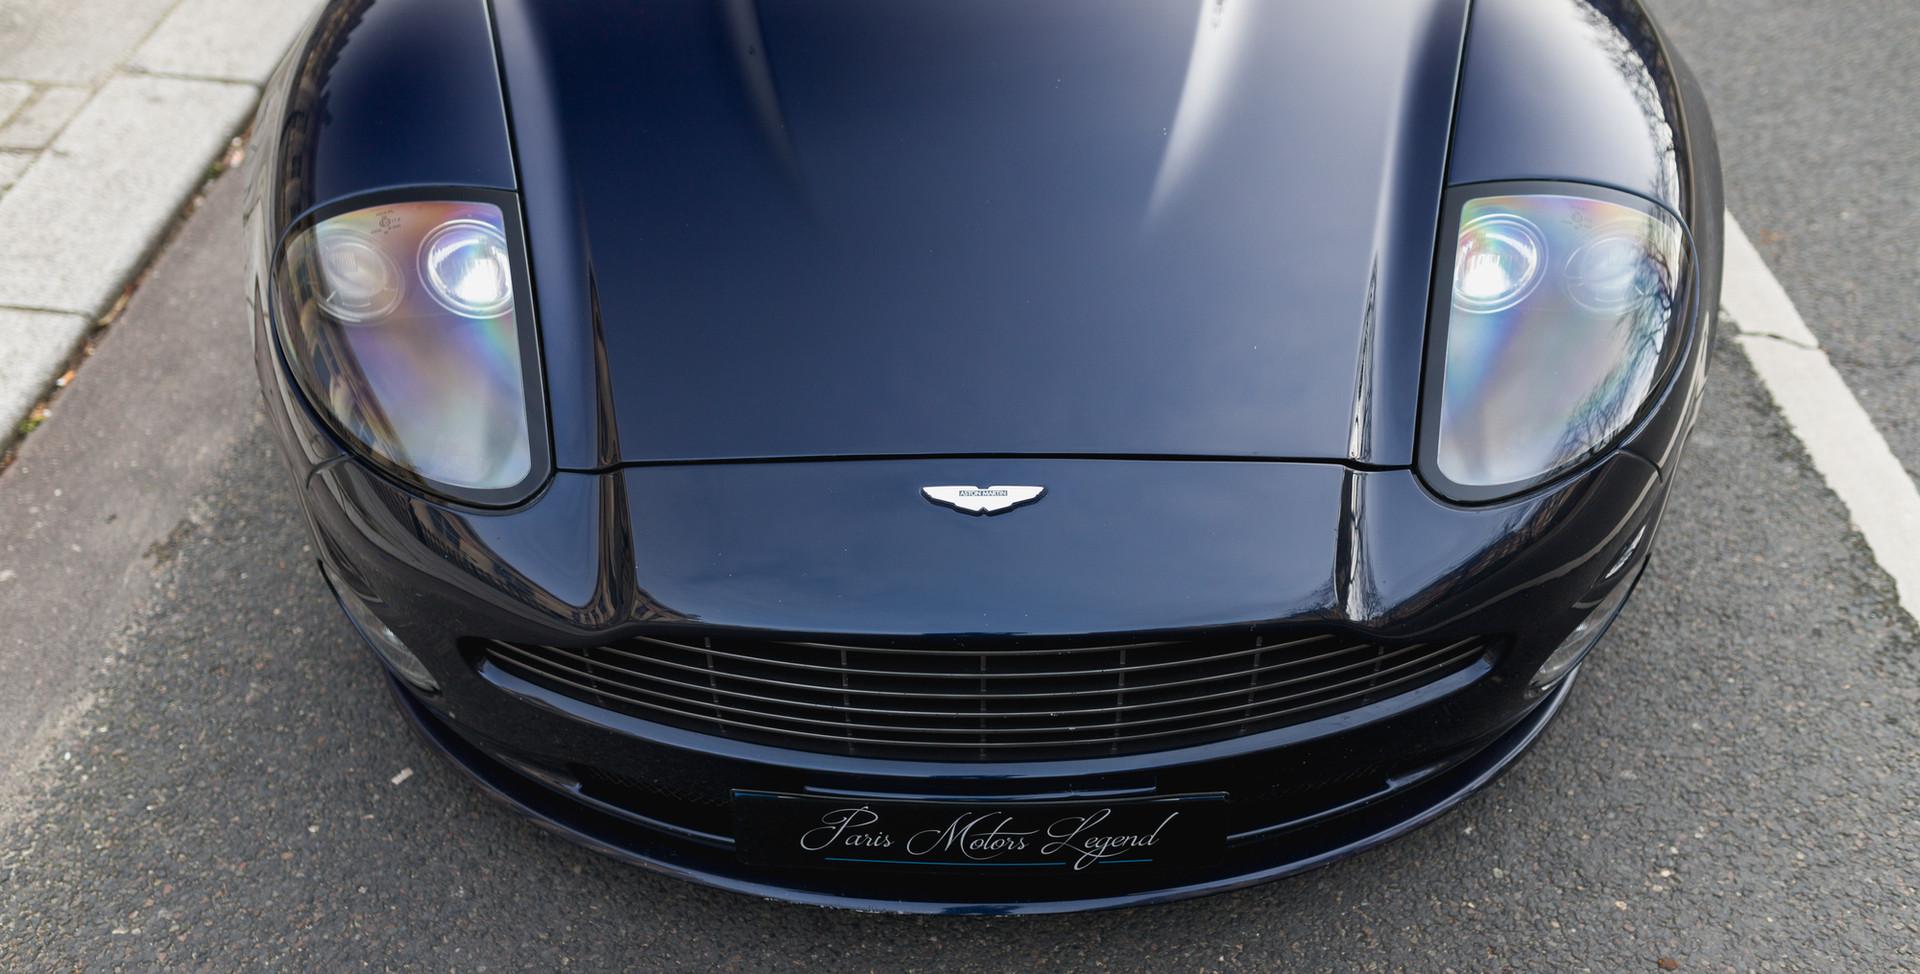 Aston Martin Vanquish S13.jpg